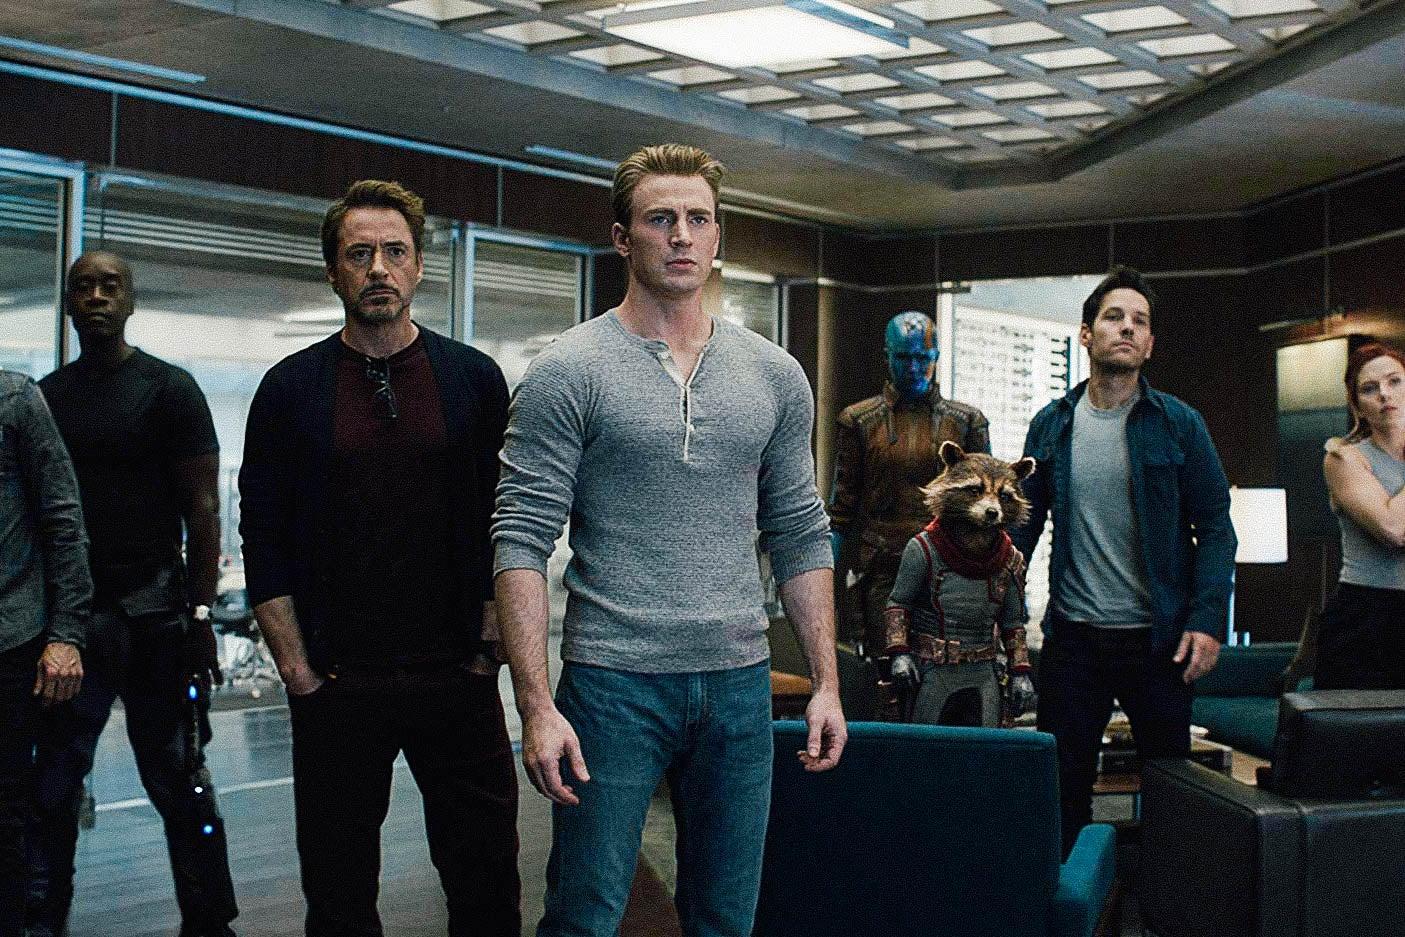 Don Cheadle as James Rhodes, Robert Downey Jr. as Tony Stark, Chris Evans as Steve Rogers, Karen Gillan as Nebula, Rocket Raccoon, Paul Rudd as Ant-Man, and Scarlett Johansson as Black Widow in a meeting room in a scene from Avengers: Endgame.